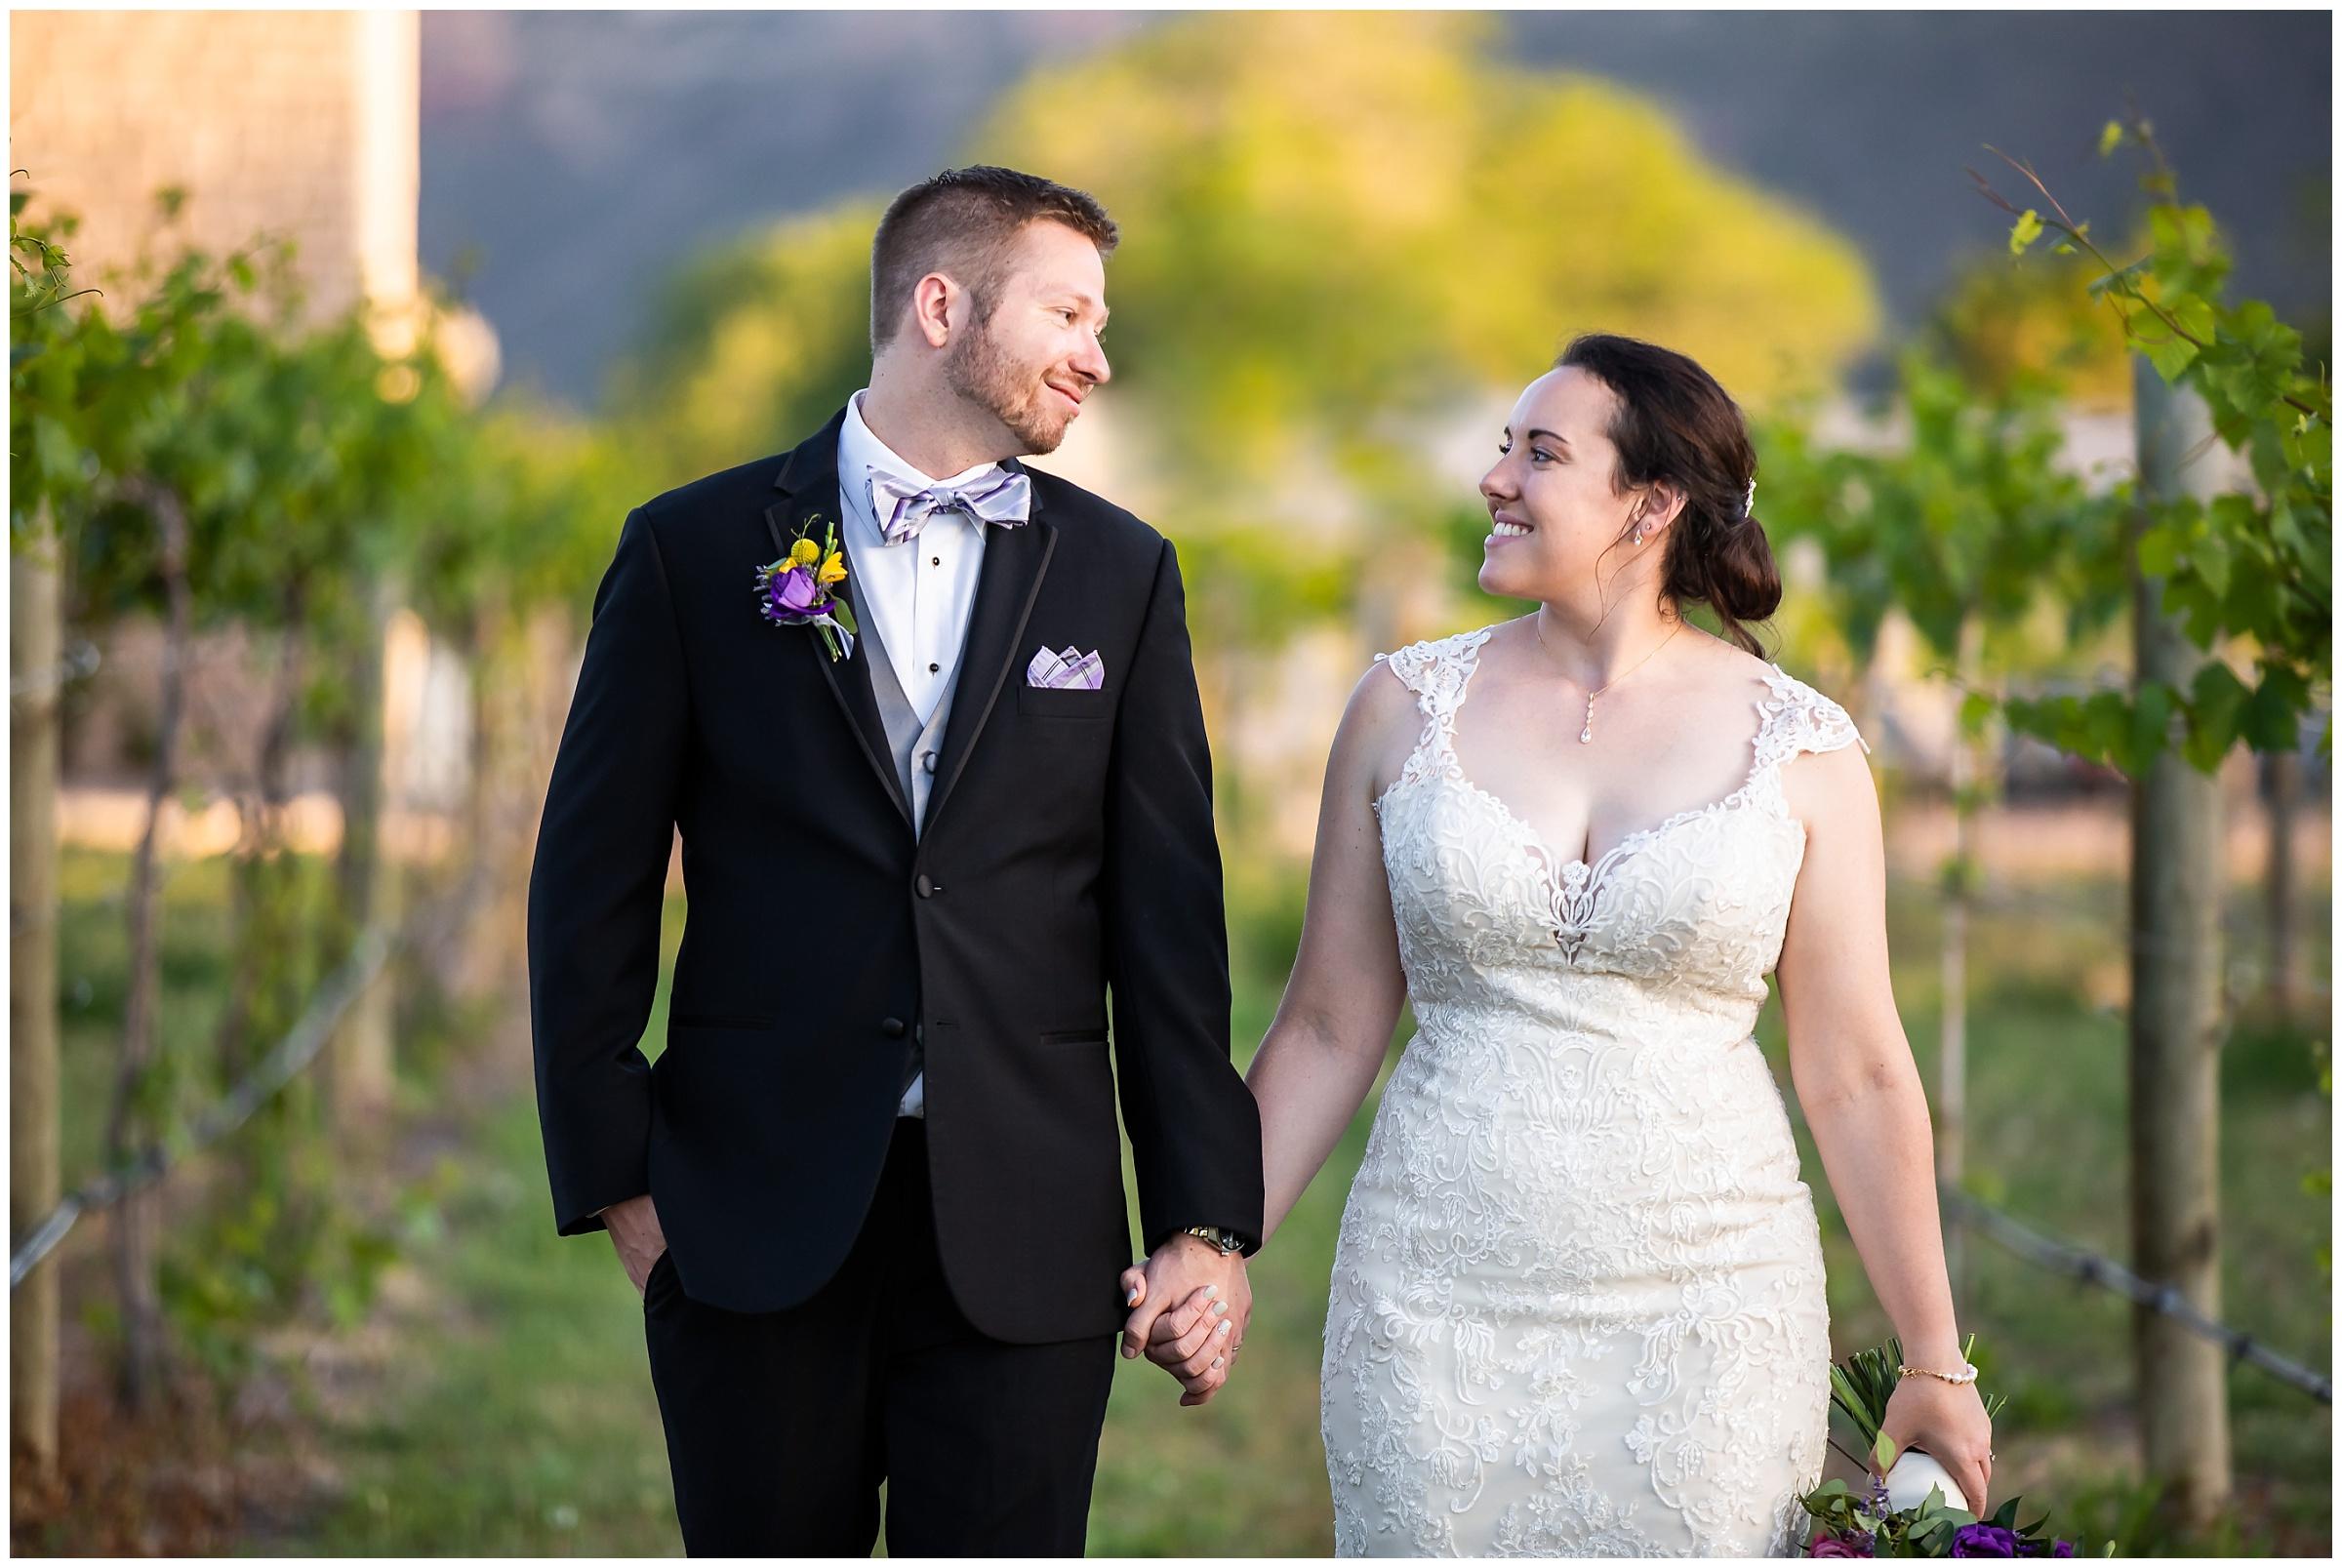 Grand Junction Wedding Photographer 0058.jpg